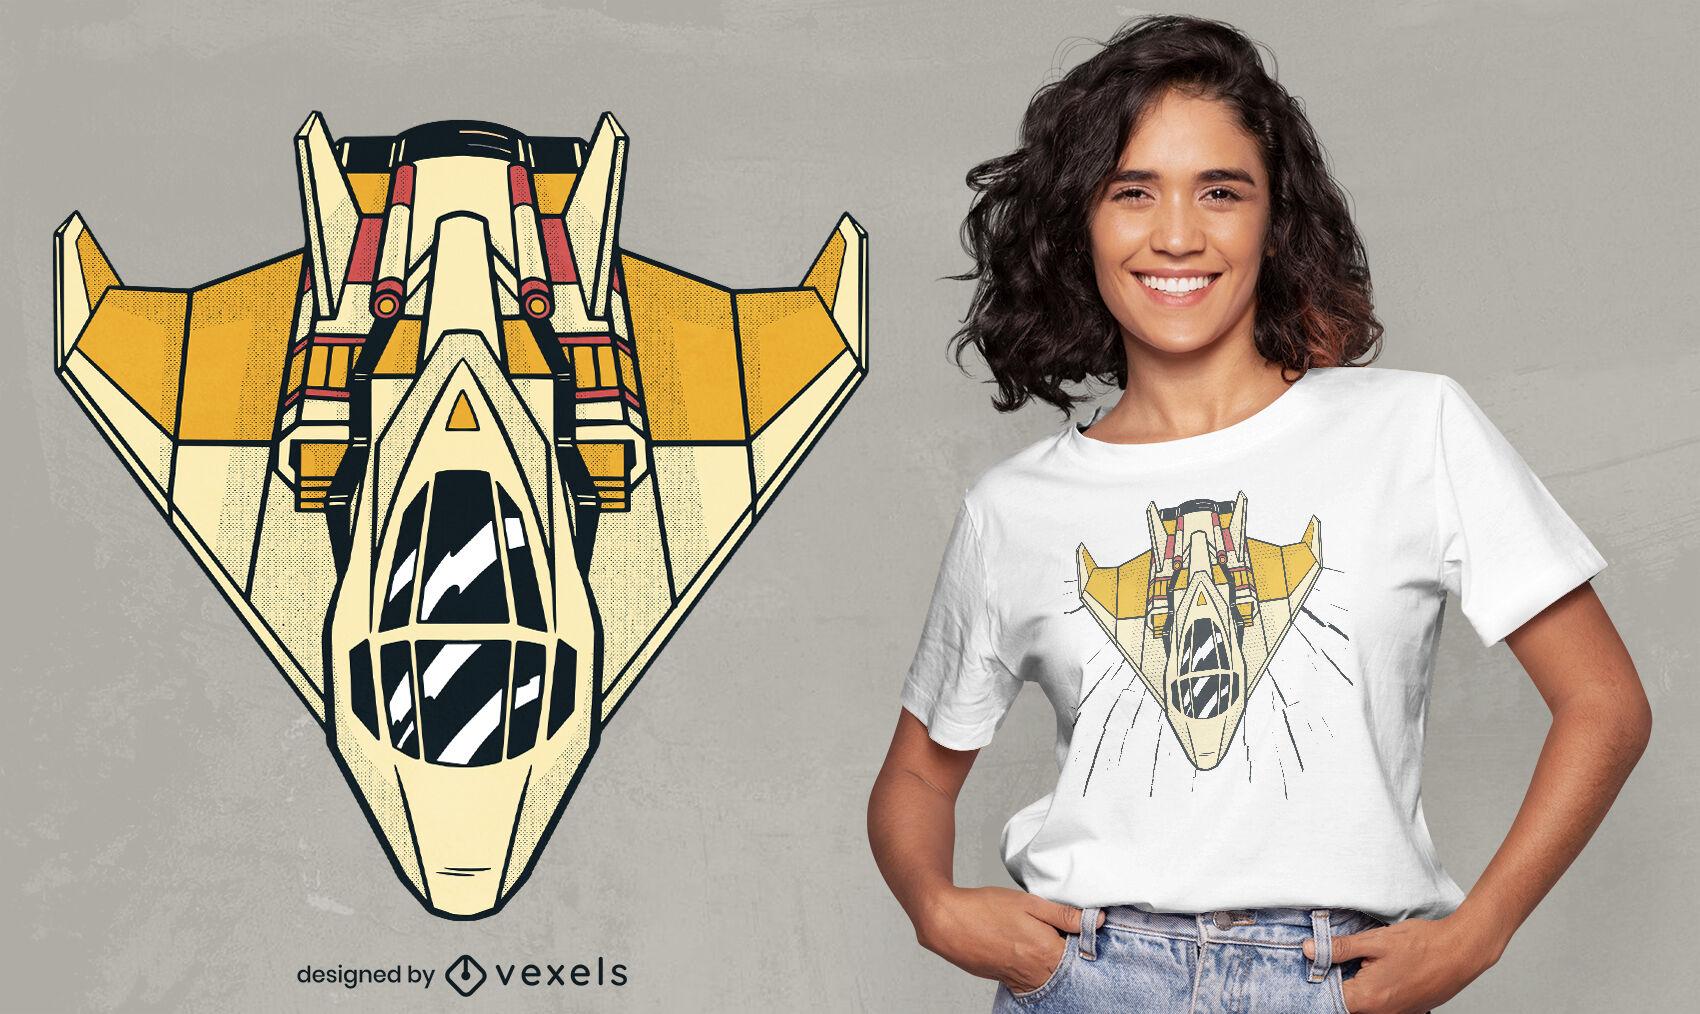 ANFRAGE Cooles Flugzeug T-Shirt Design